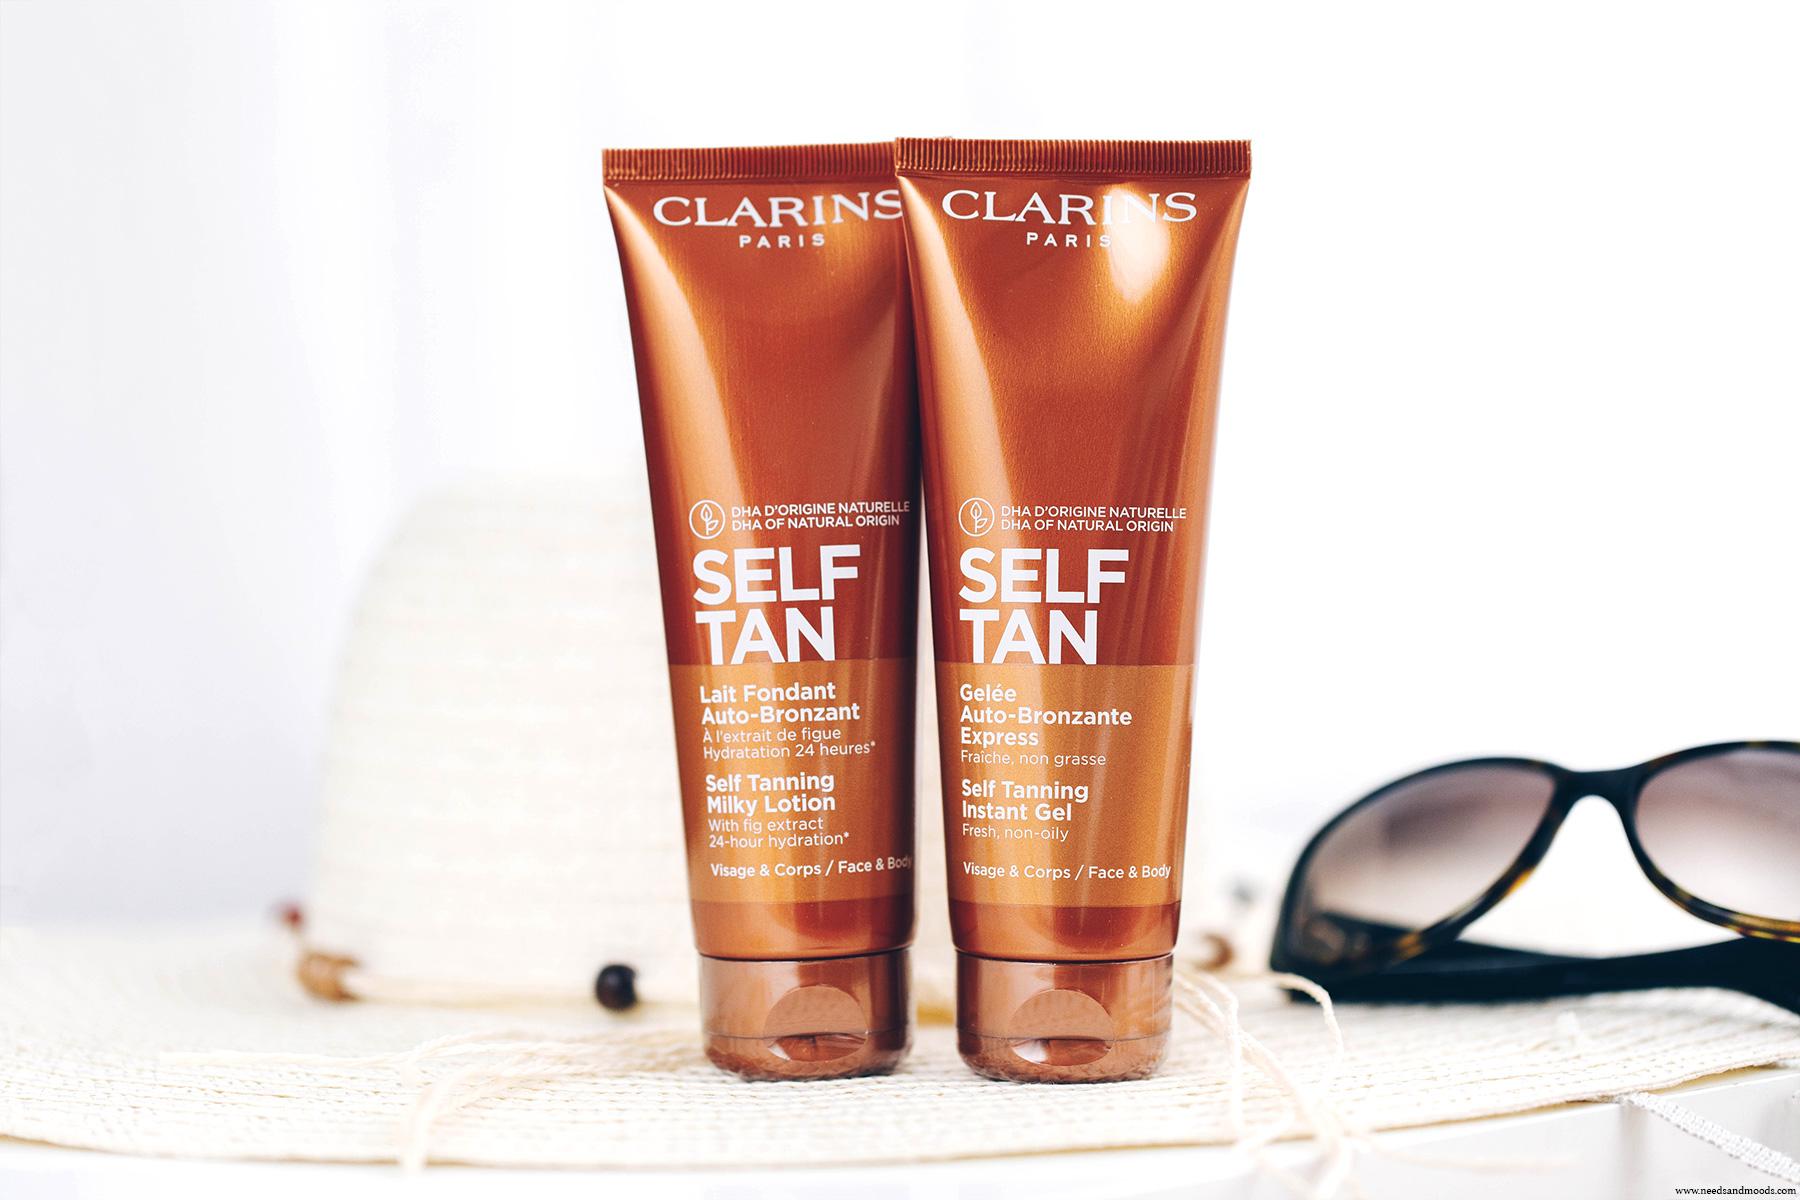 clarins self tan lait fondant auto-bronzant